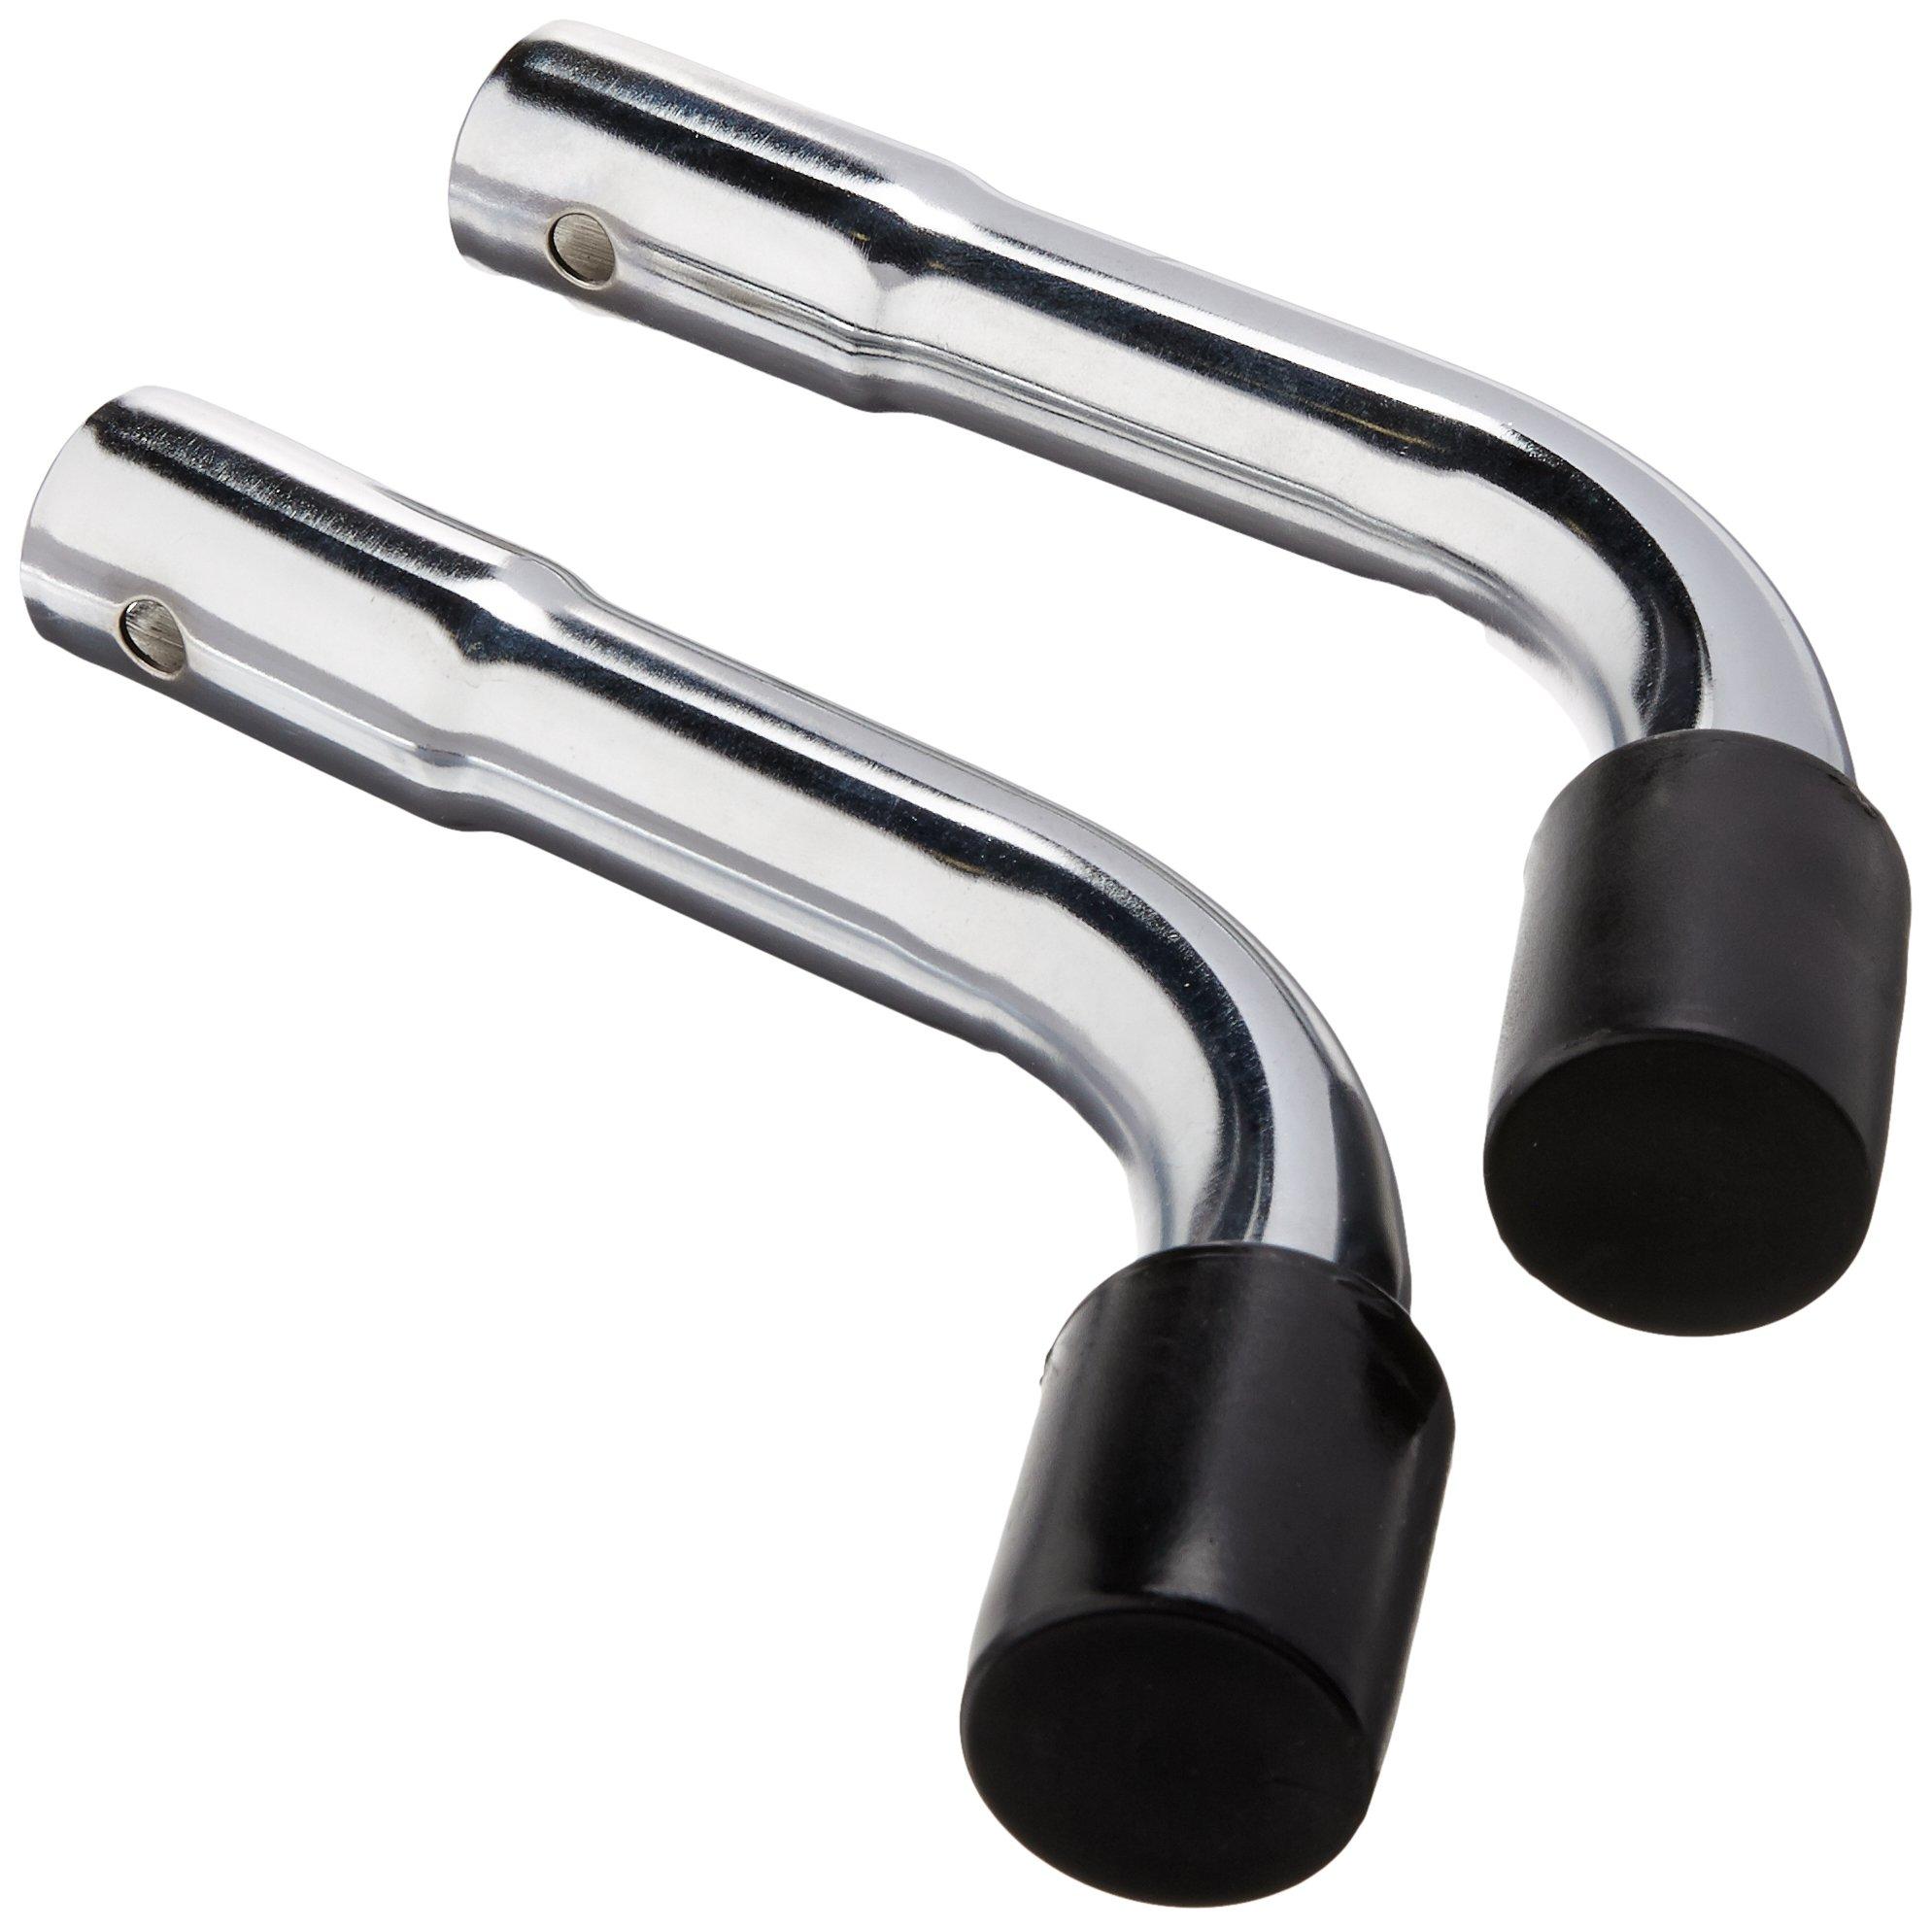 Medline MDS85189 Wheelchair Rear Anti-Tip Devices